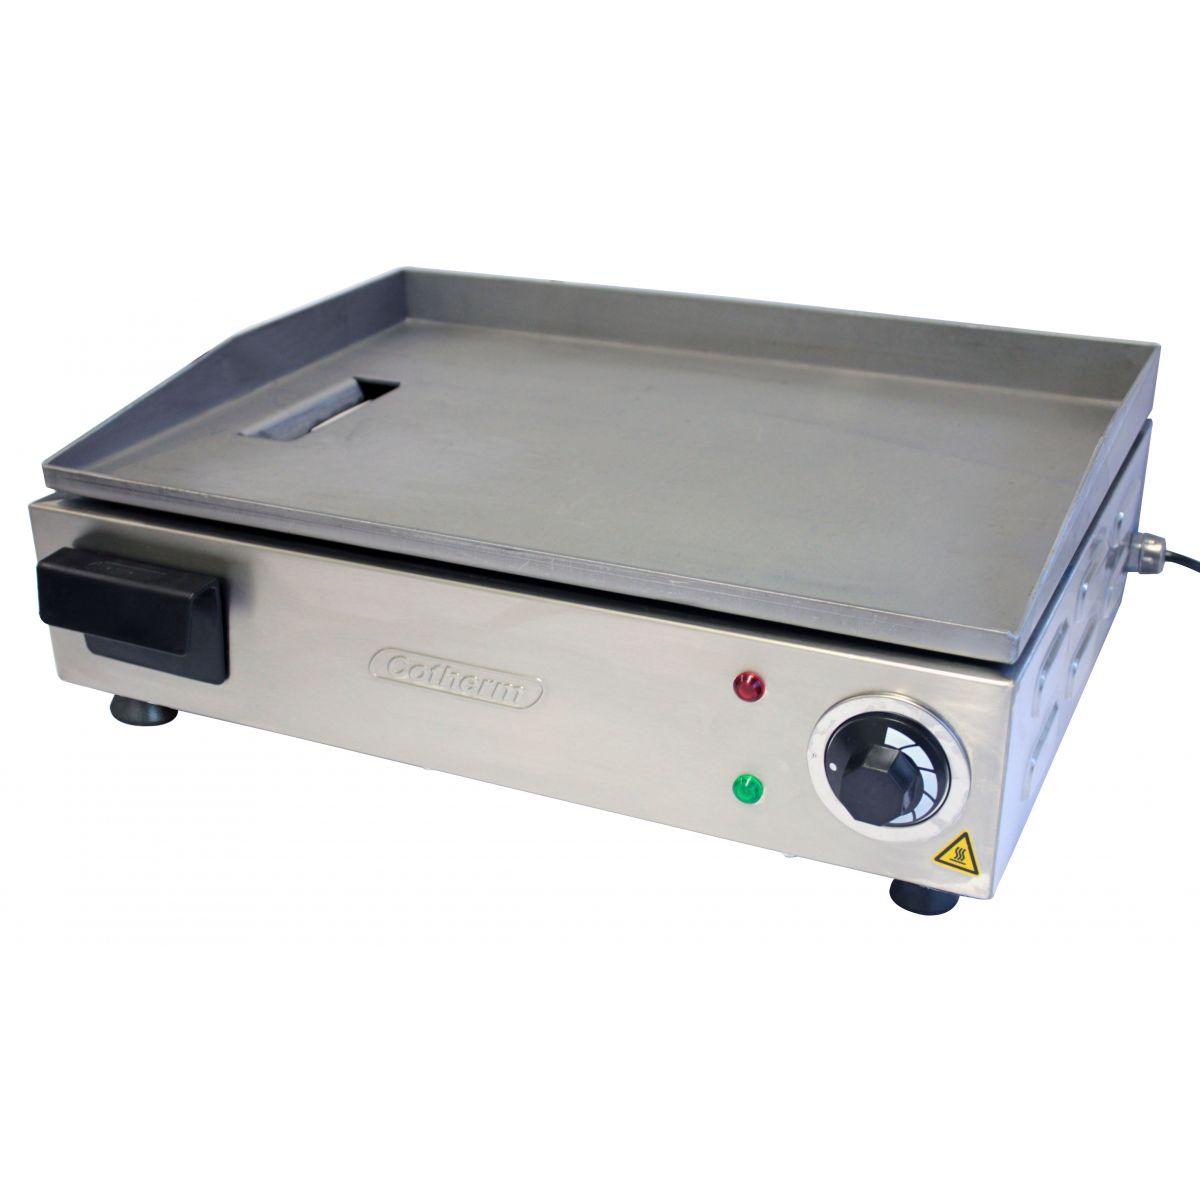 Chapeira para Lanches elétrica Profissional 50x35cm 1600W Cotherm  - Mix Eletro